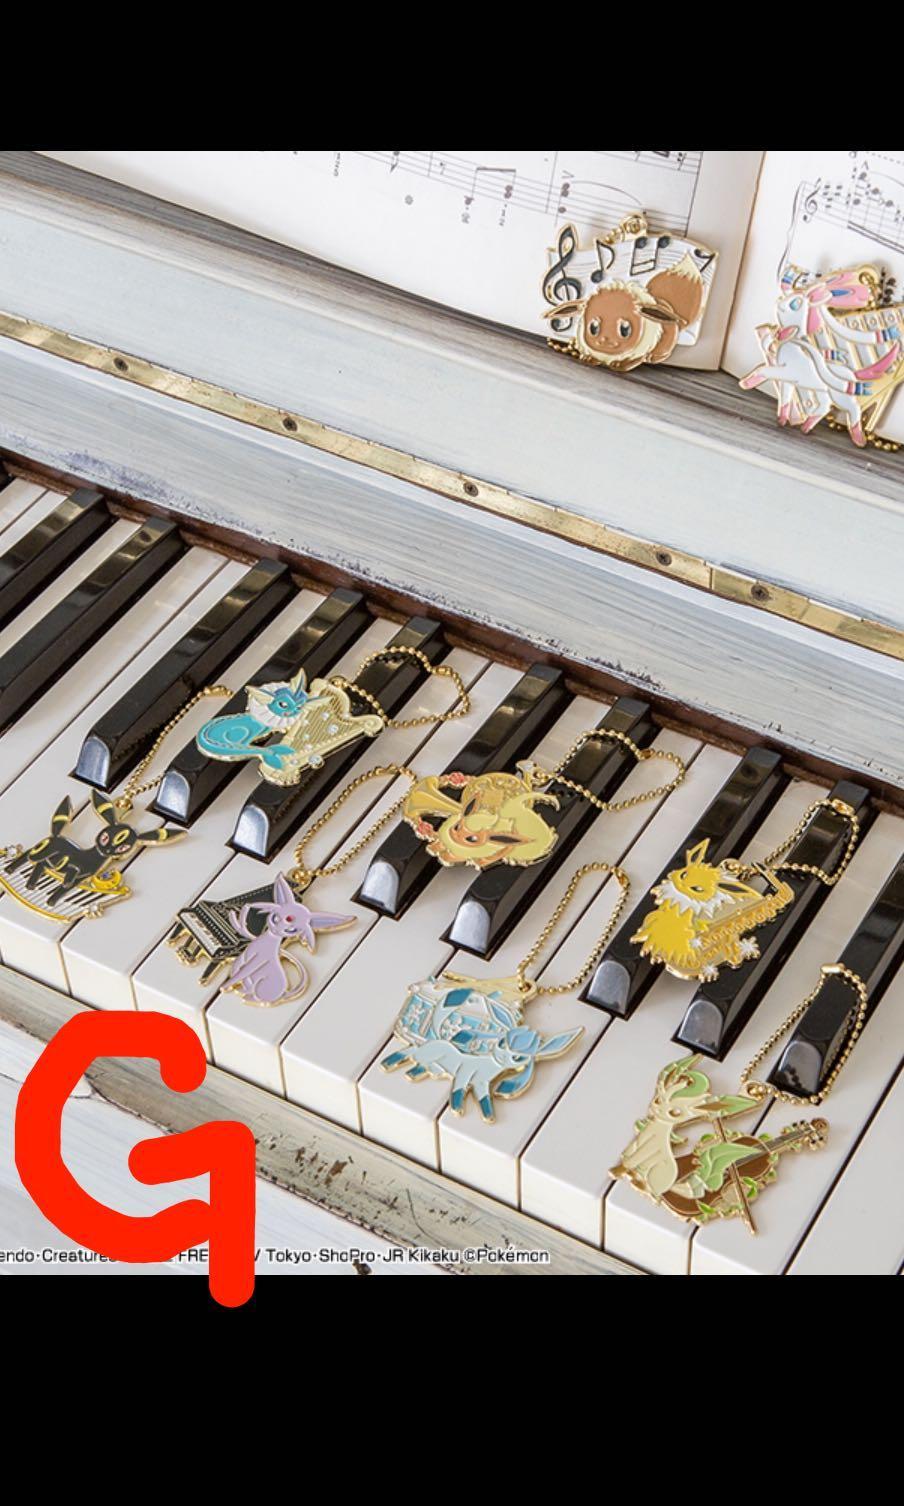 Eevee Kuji Melodies Complete set of Prizes